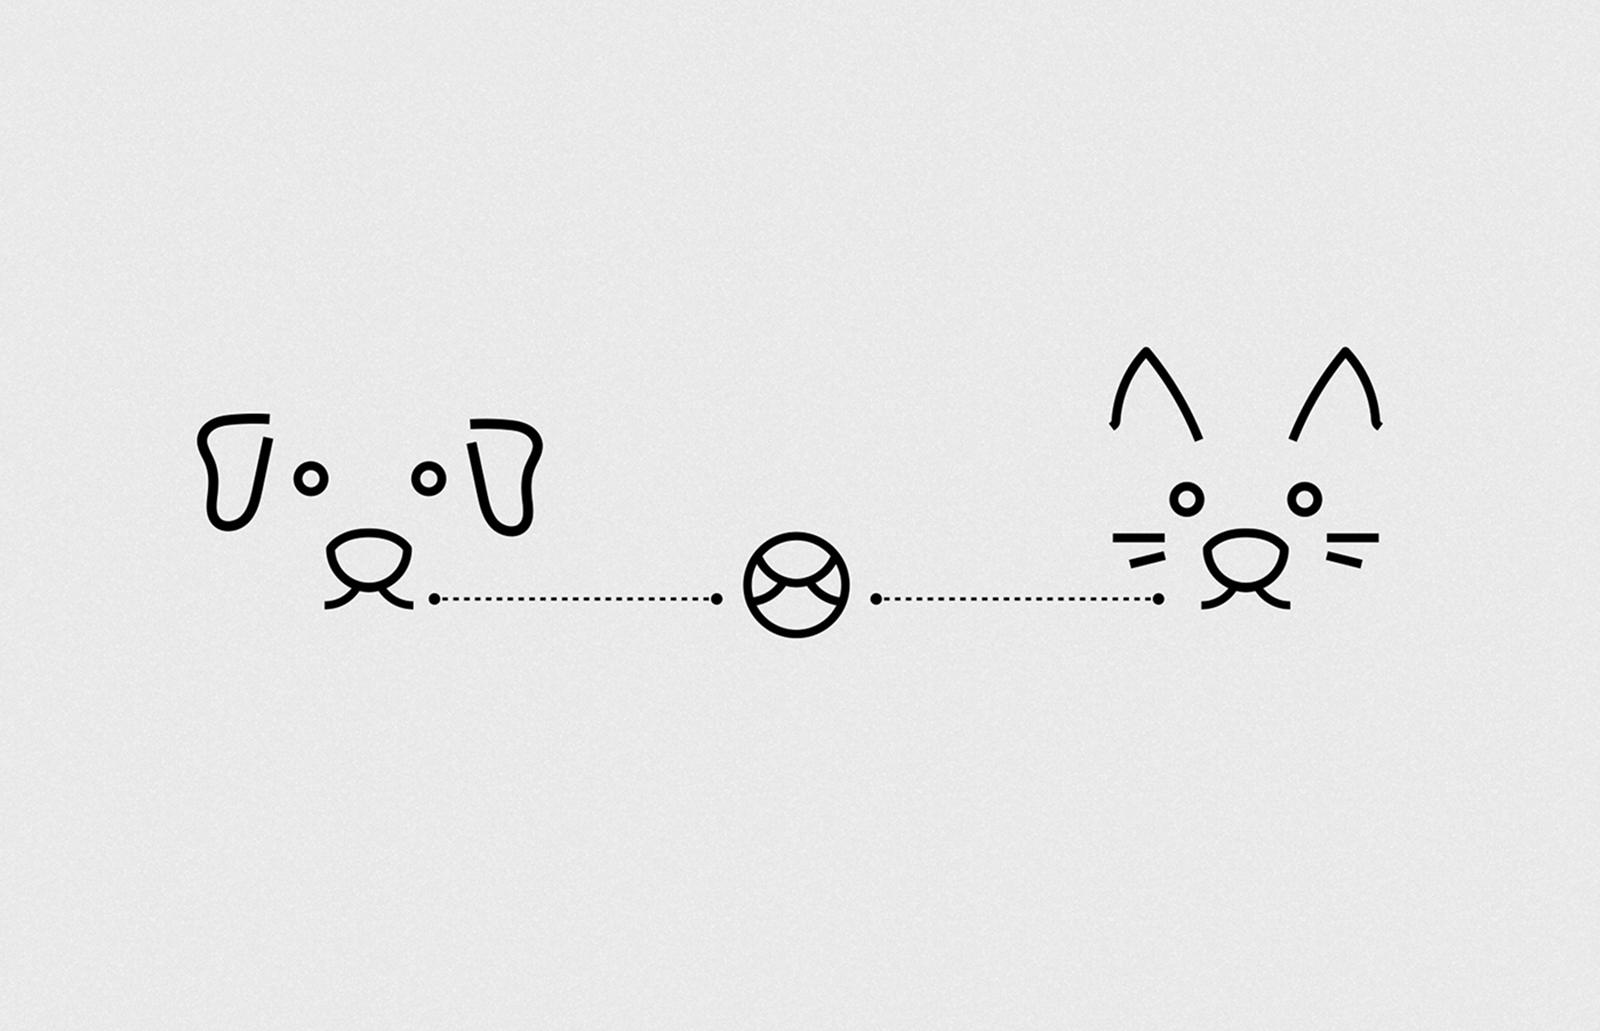 Kella宠物食品品牌视觉VI形象设计欣赏-深圳VI设计3